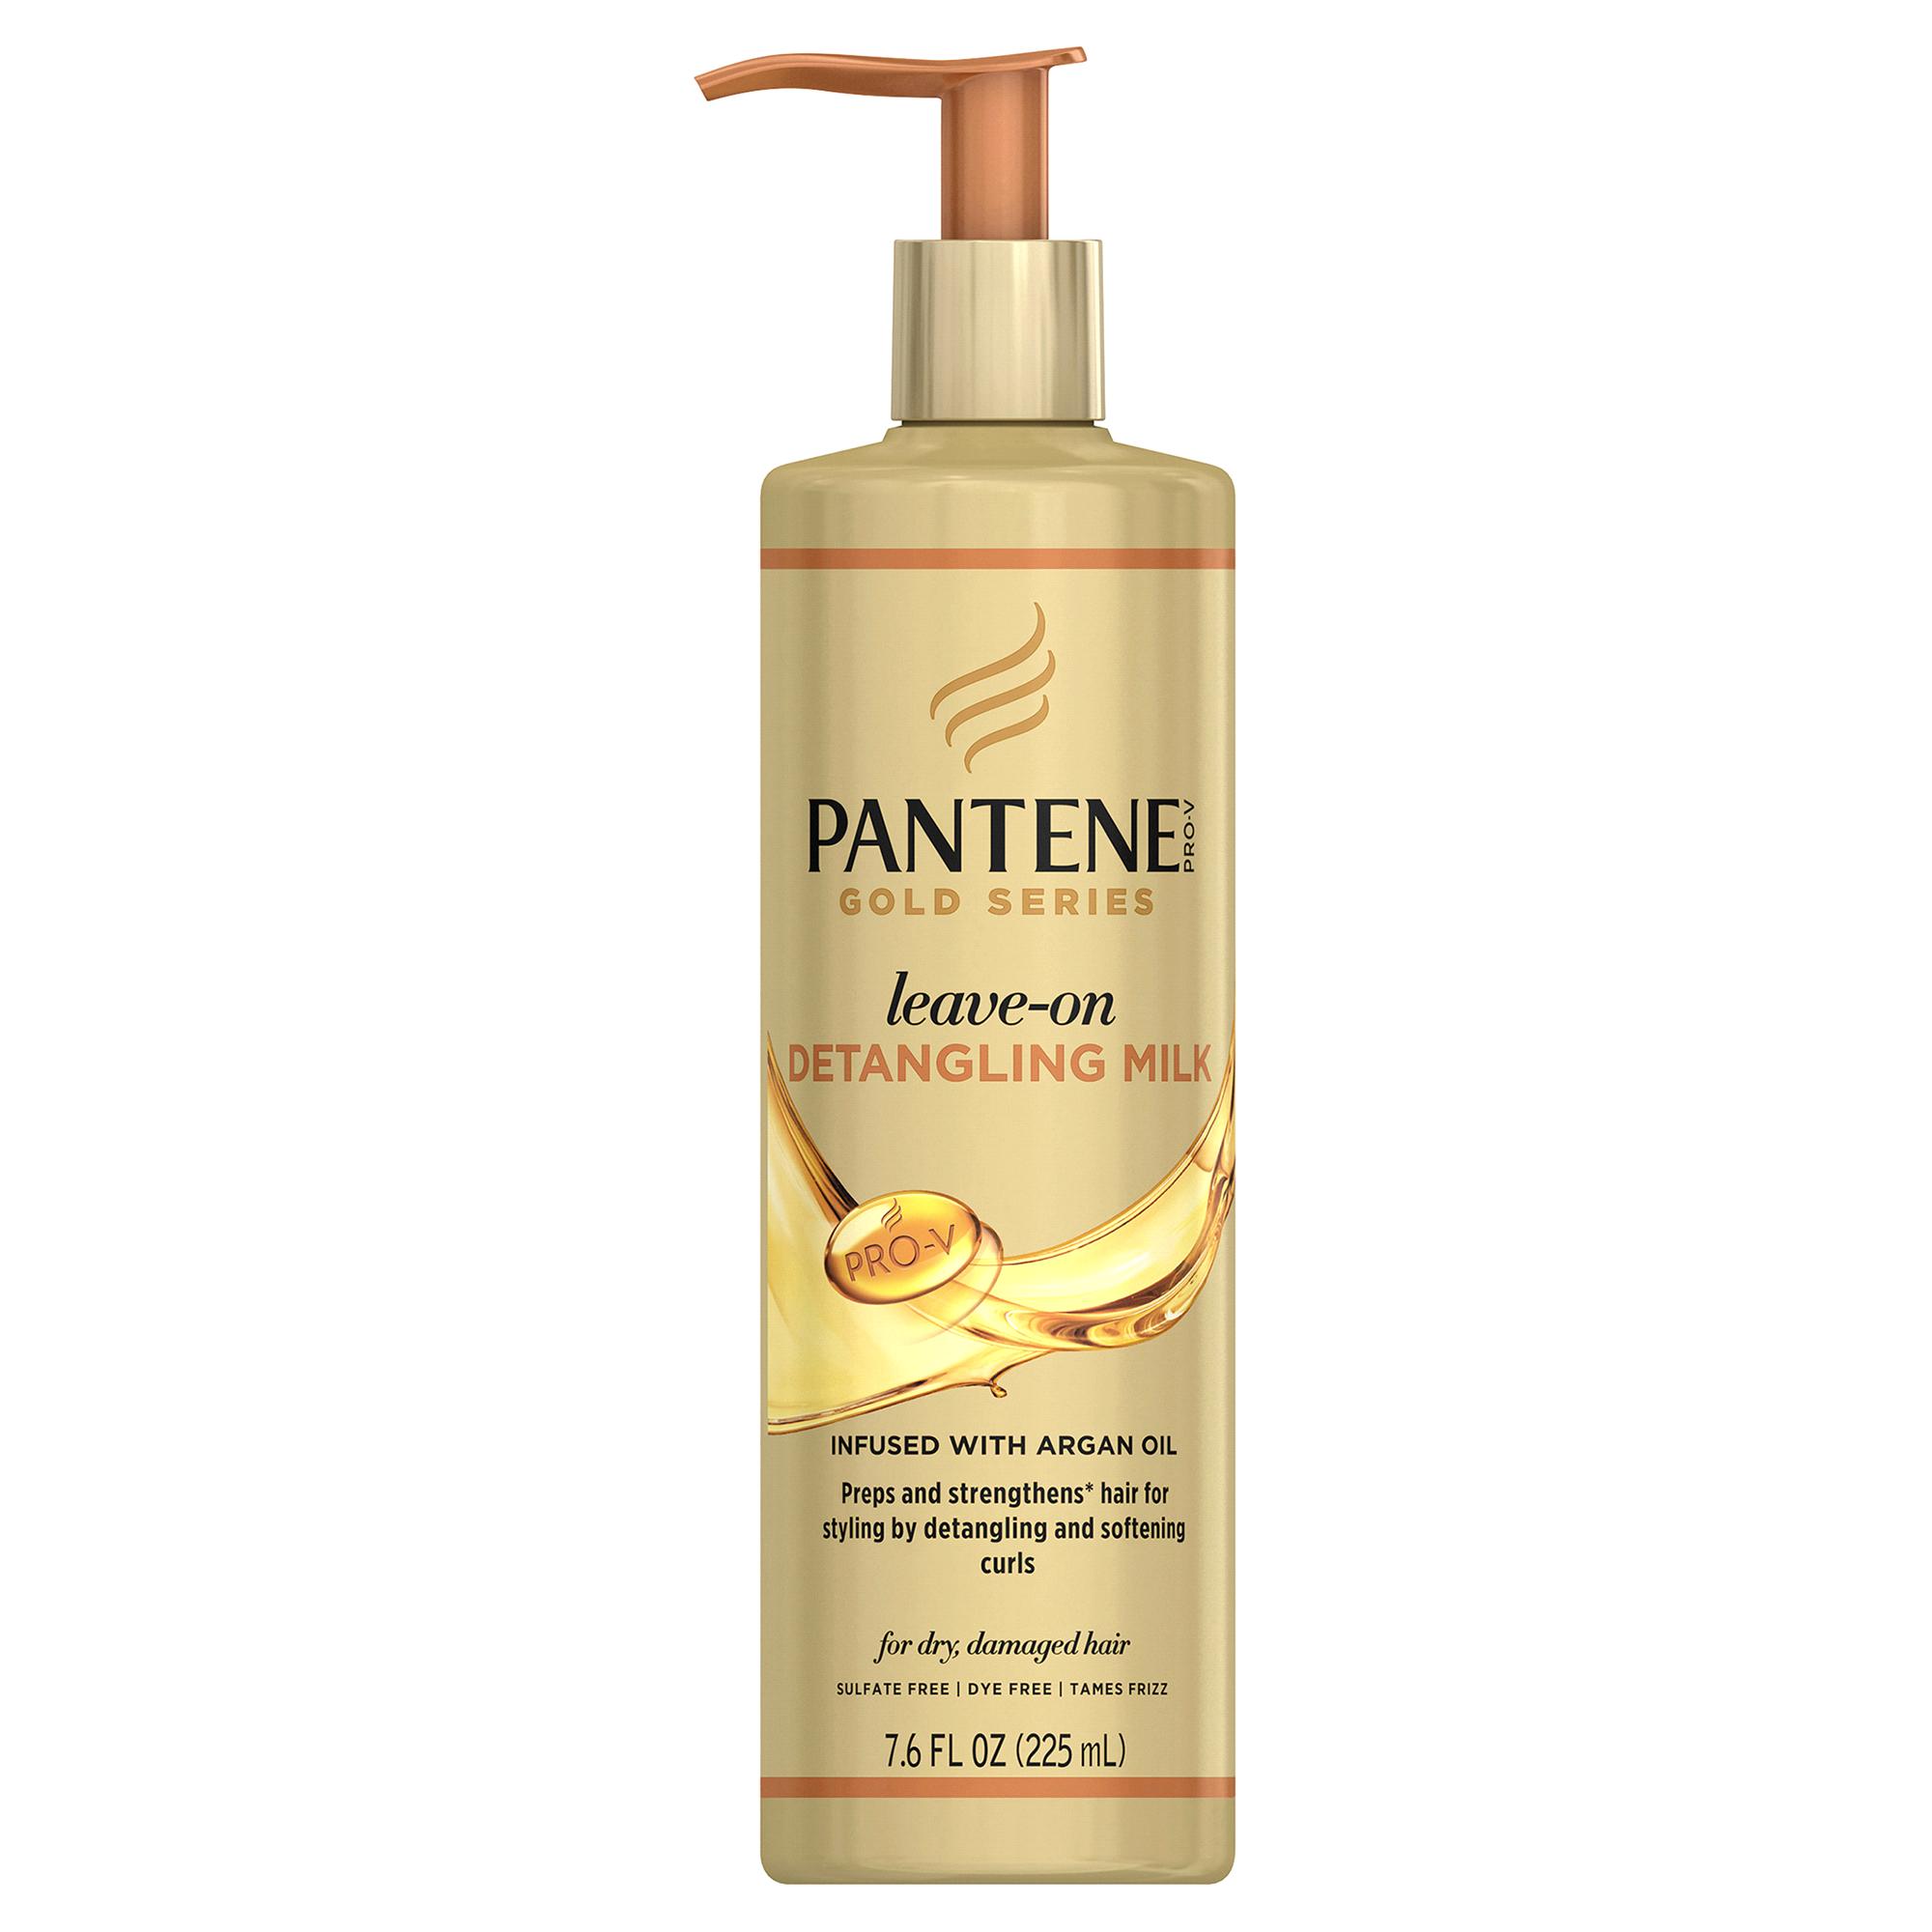 Pantene Pro V Gold Series Leave On Detangling Milk 76 Fl Oz Circuit Board Plastic Soap Lotion Dispenser Select Size Potty